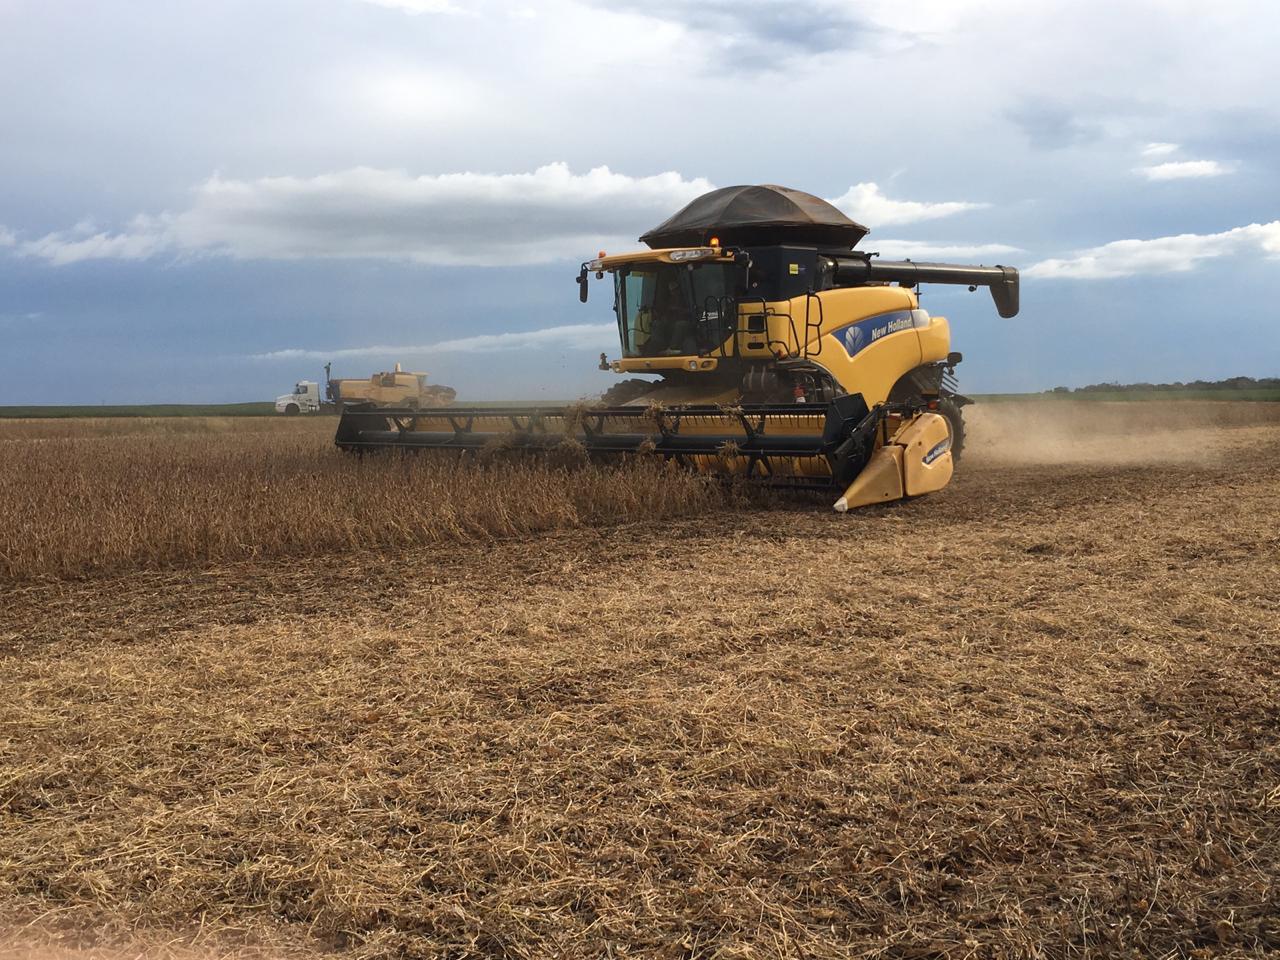 Colheita de soja em Darcinopolis-Tocantins Enviado Marcílio Fernandes Marangoni